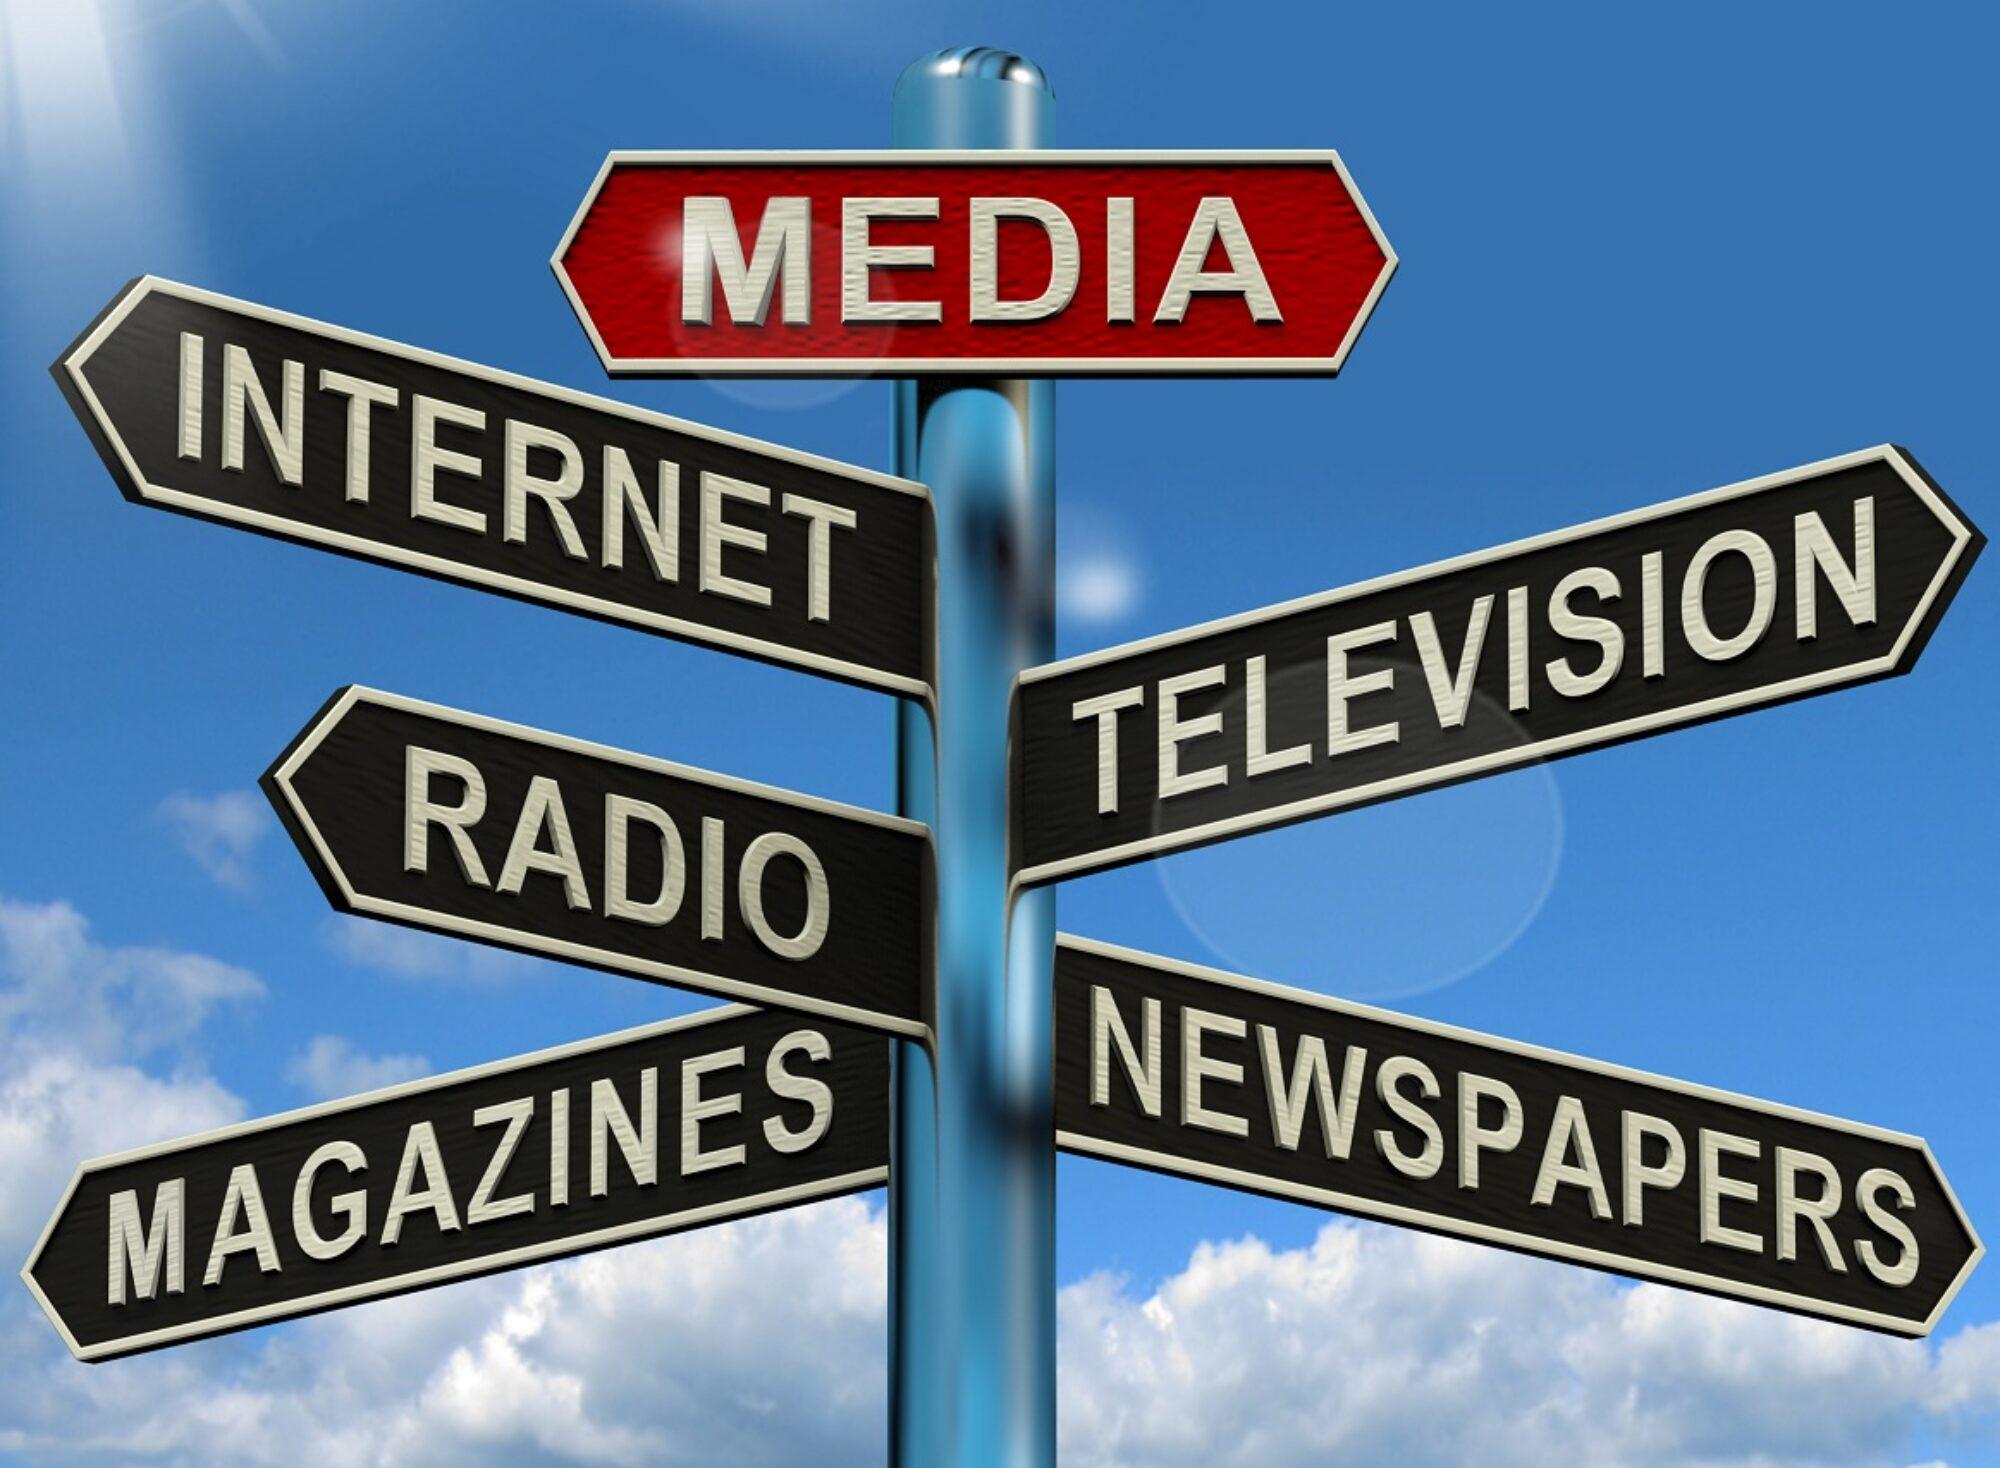 AMC MEDIA